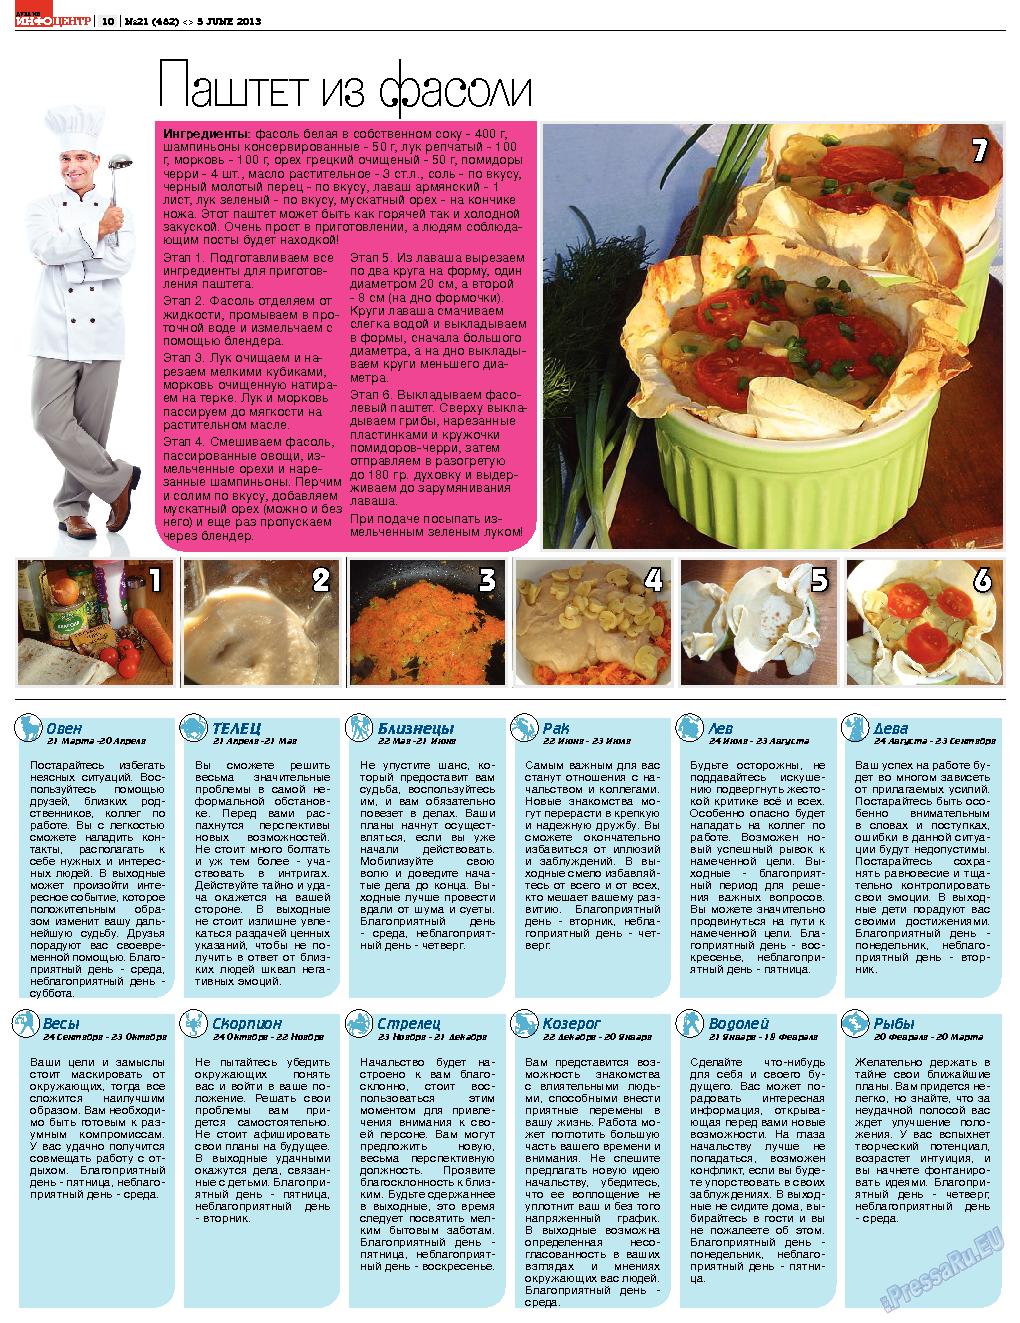 Дублин инфоцентр (газета). 2013 год, номер 21, стр. 10